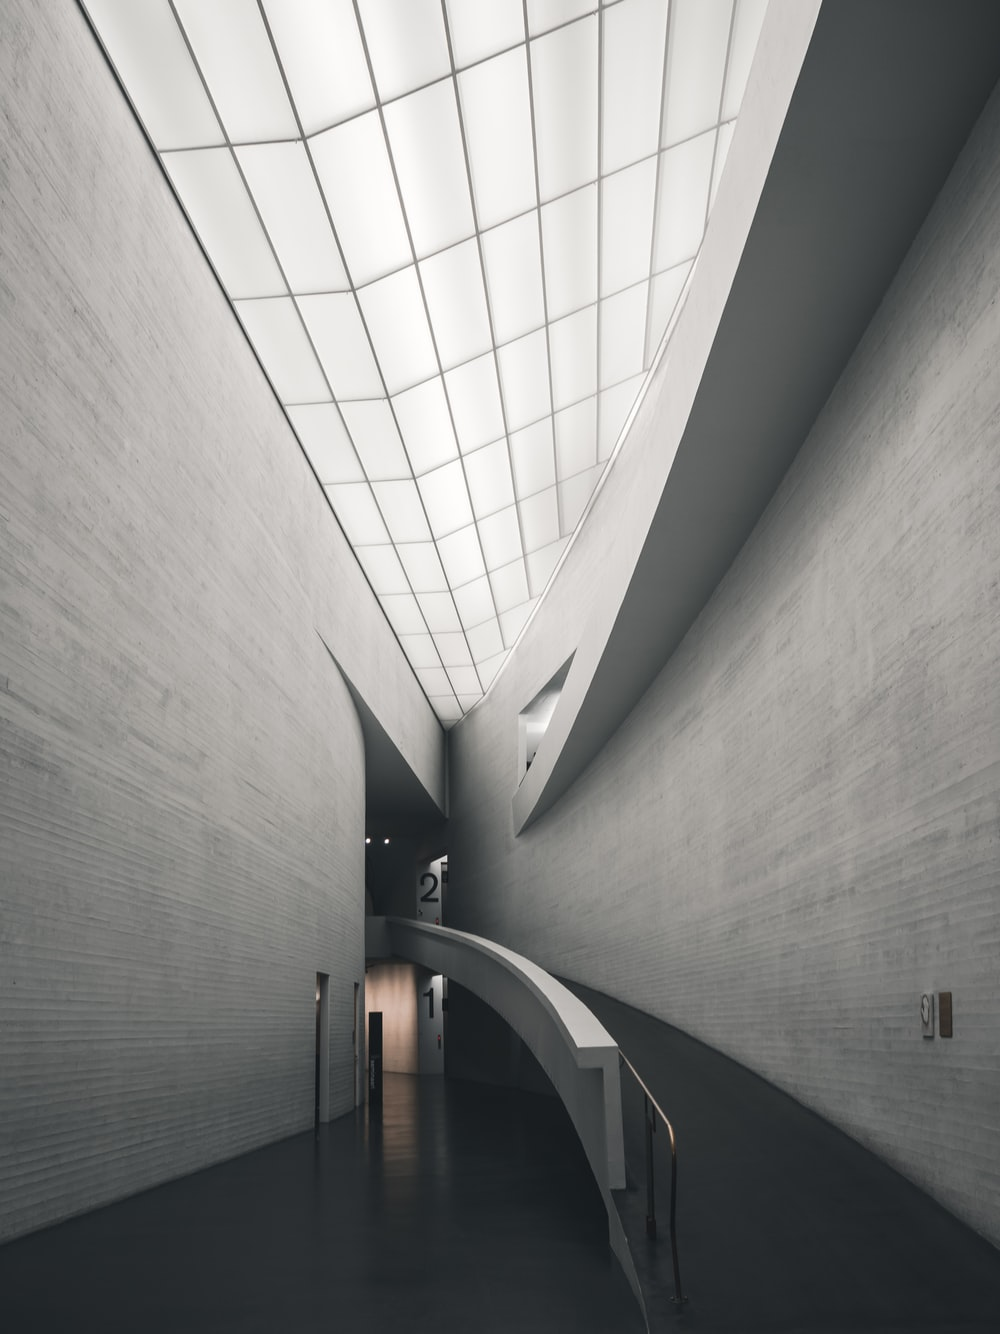 gray concrete wall inside building